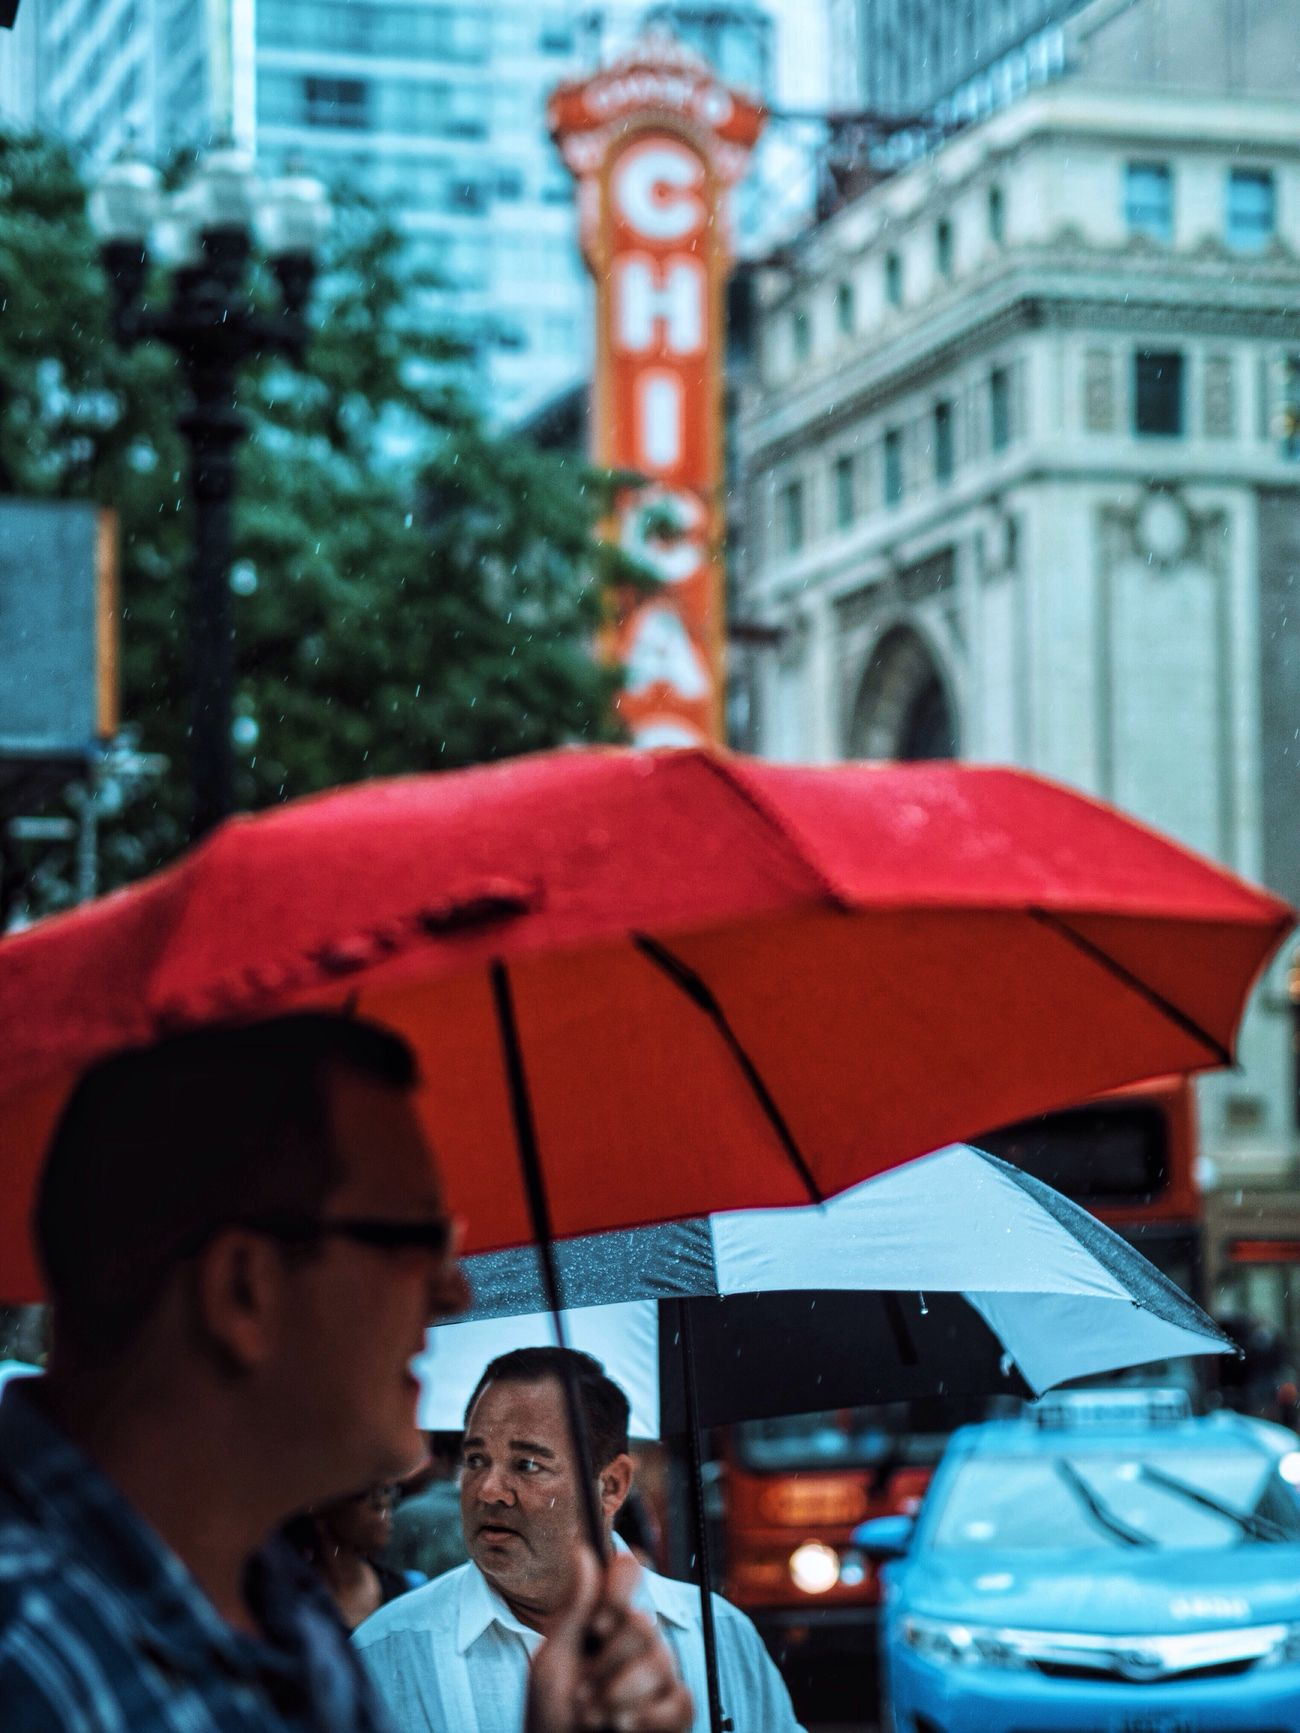 EyeEm Best Shots Eyeemphoto Architecture Raindrops Rain Chicago People Capture The Moment VSCO Mood Street Photography Colors Red Umbrella